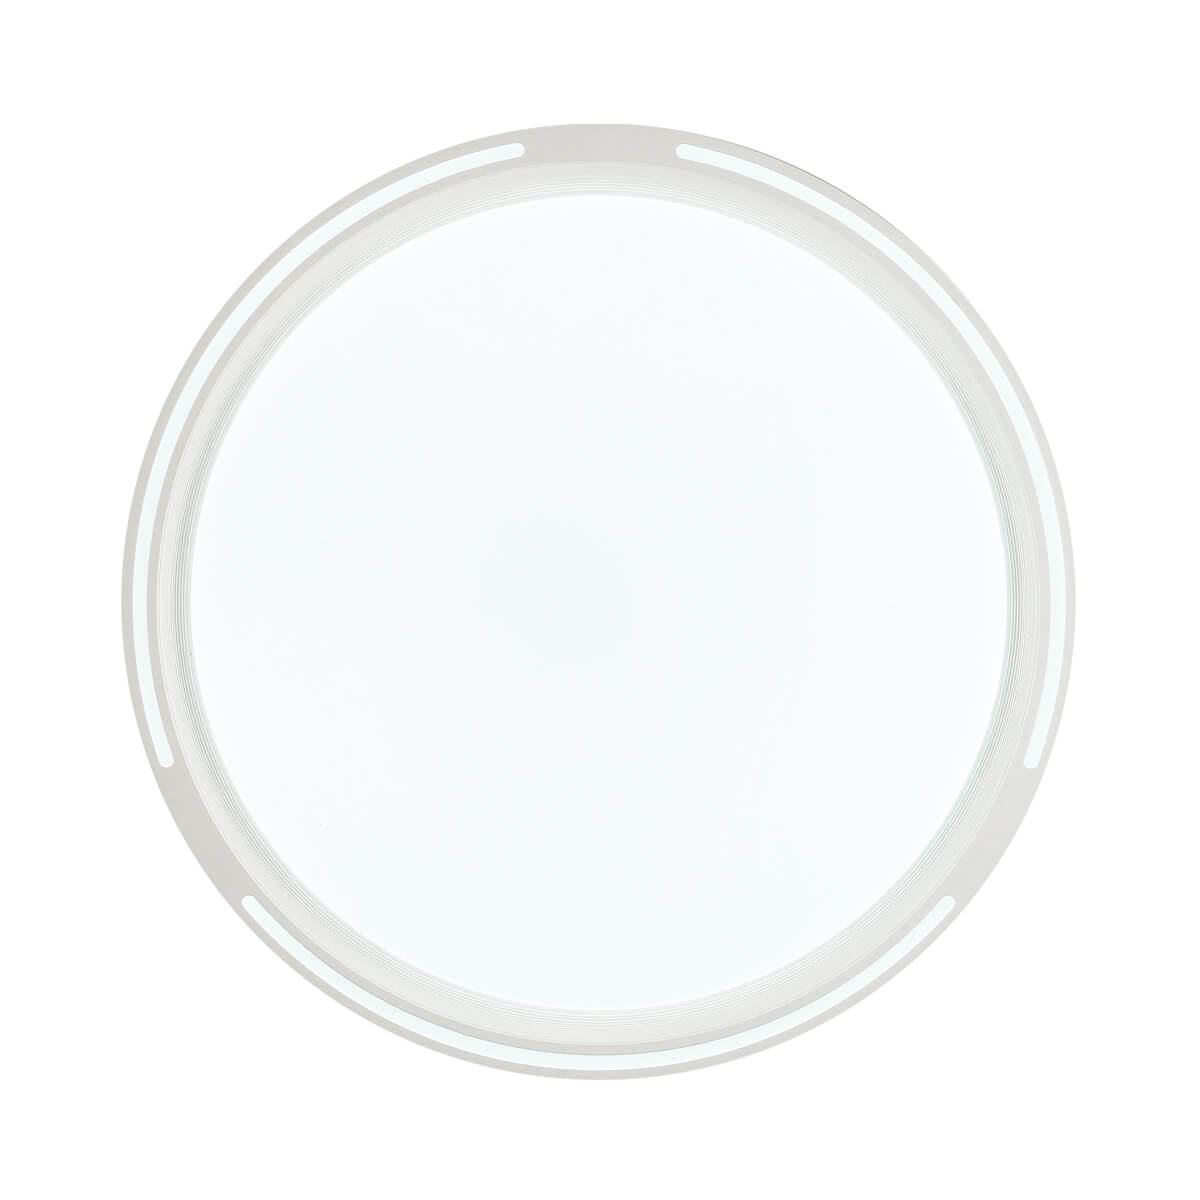 Светильник Sonex 3028/DL carlo gattini avosso 3028 3028 01